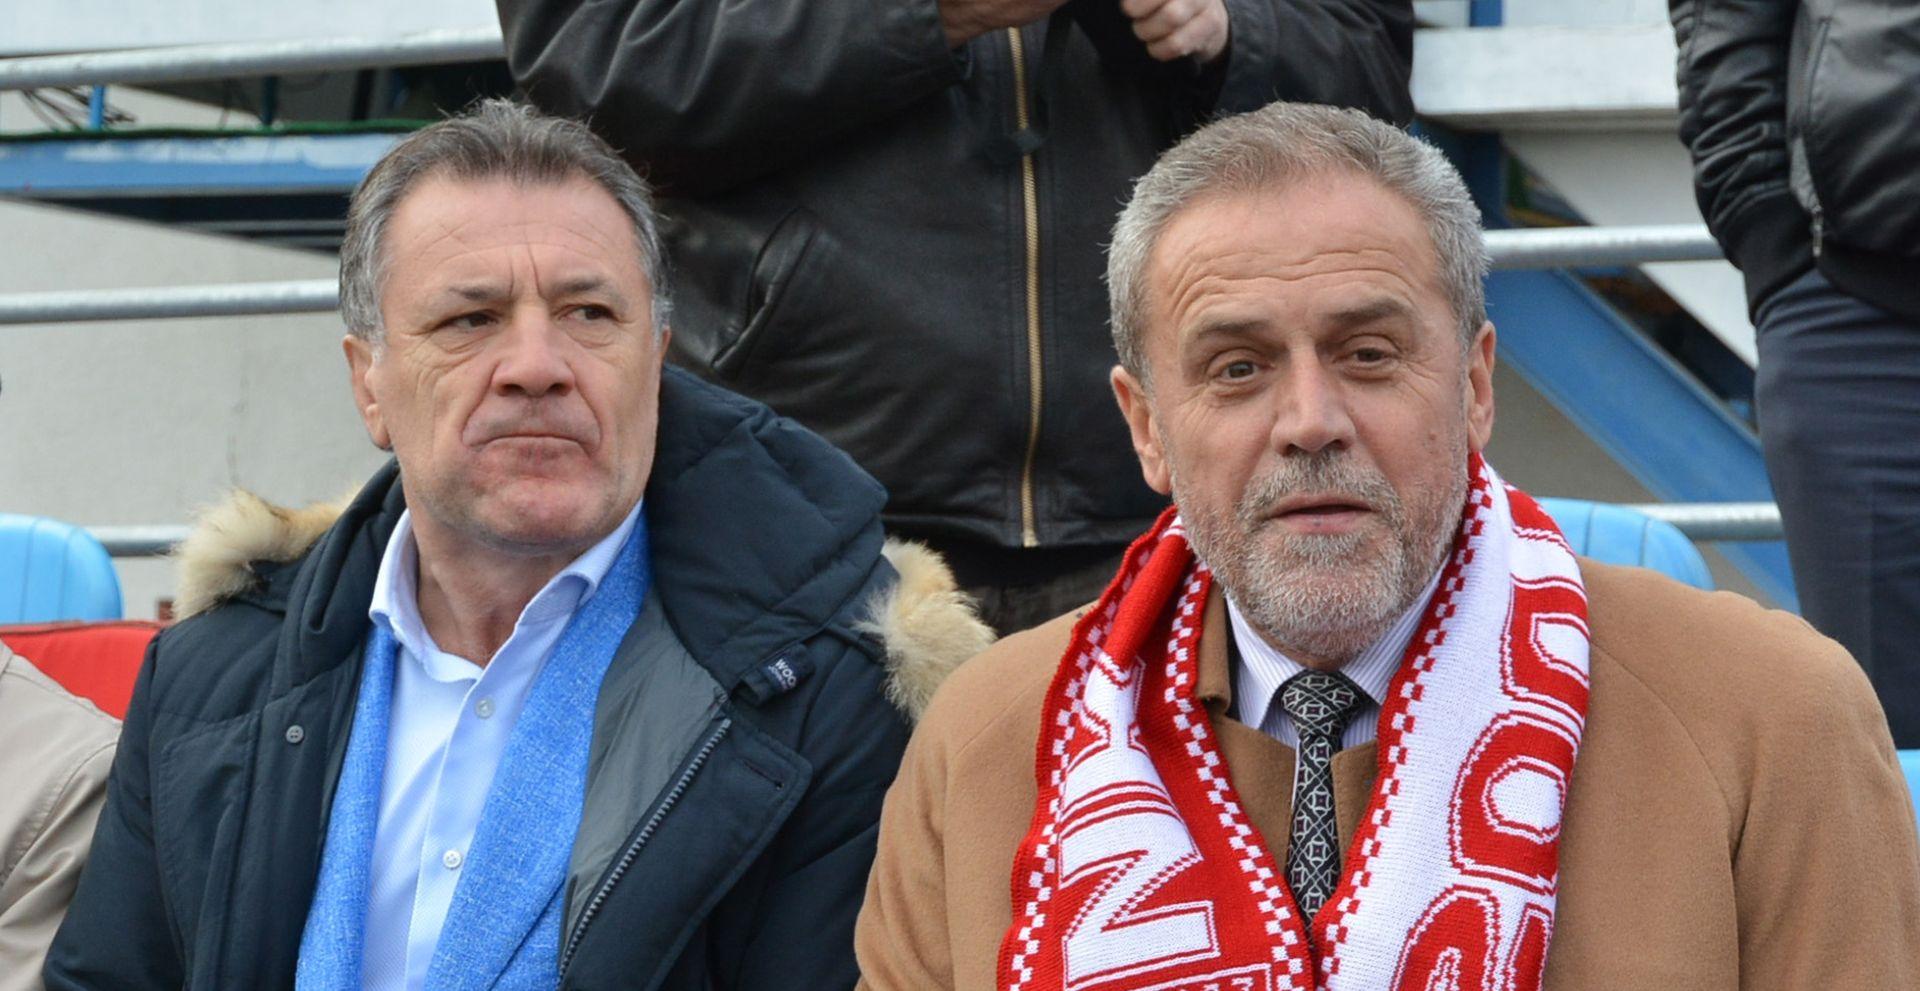 GRADSKI ODSTREL Bandić ruši Mamića za pobjedu u Zagrebu